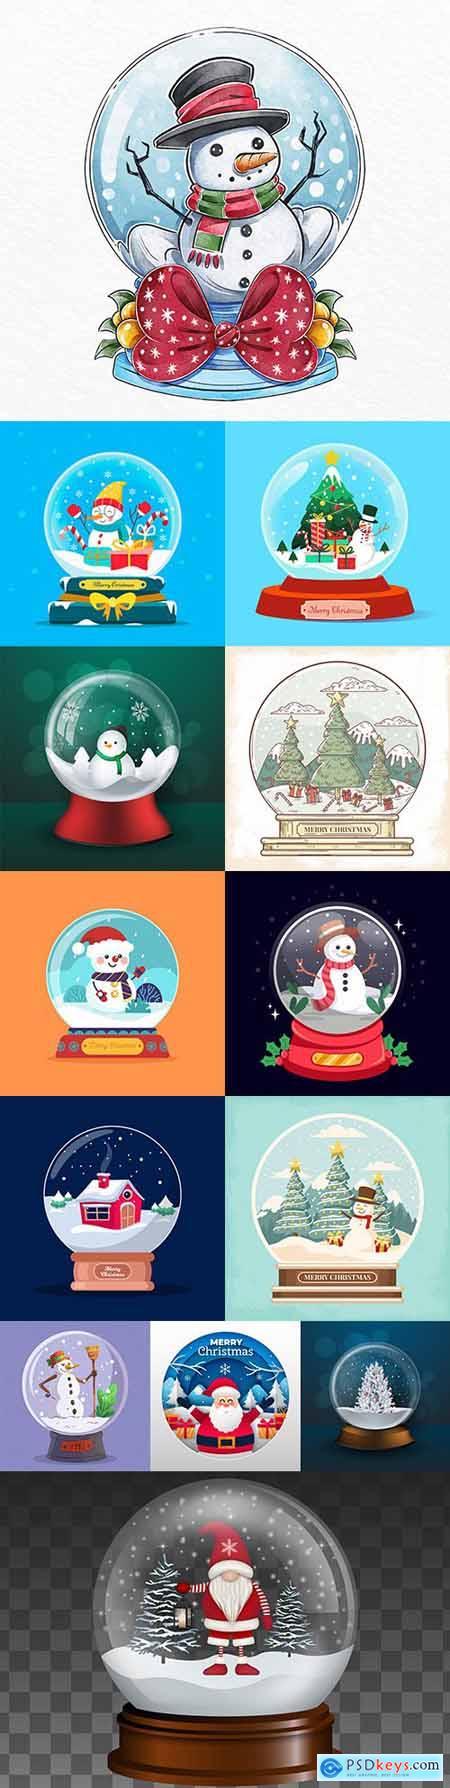 Christmas snow ball illustration in flat design